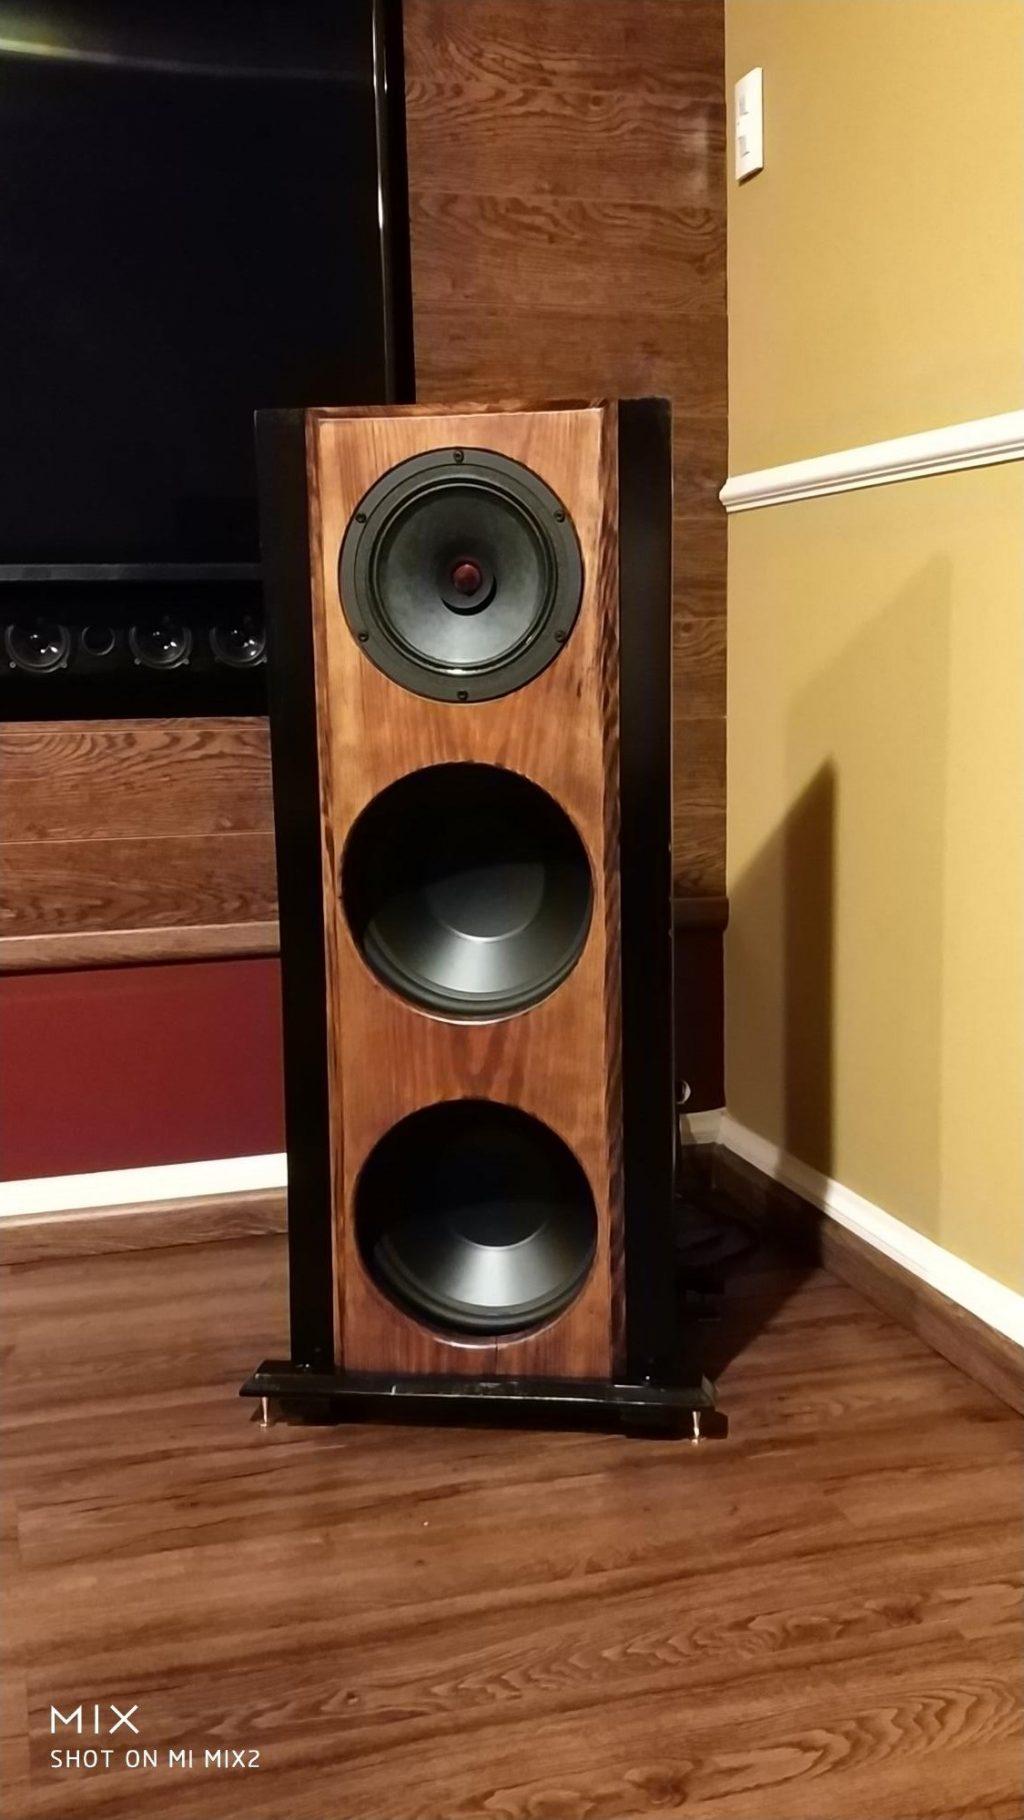 Two Speakers Speaker Stand